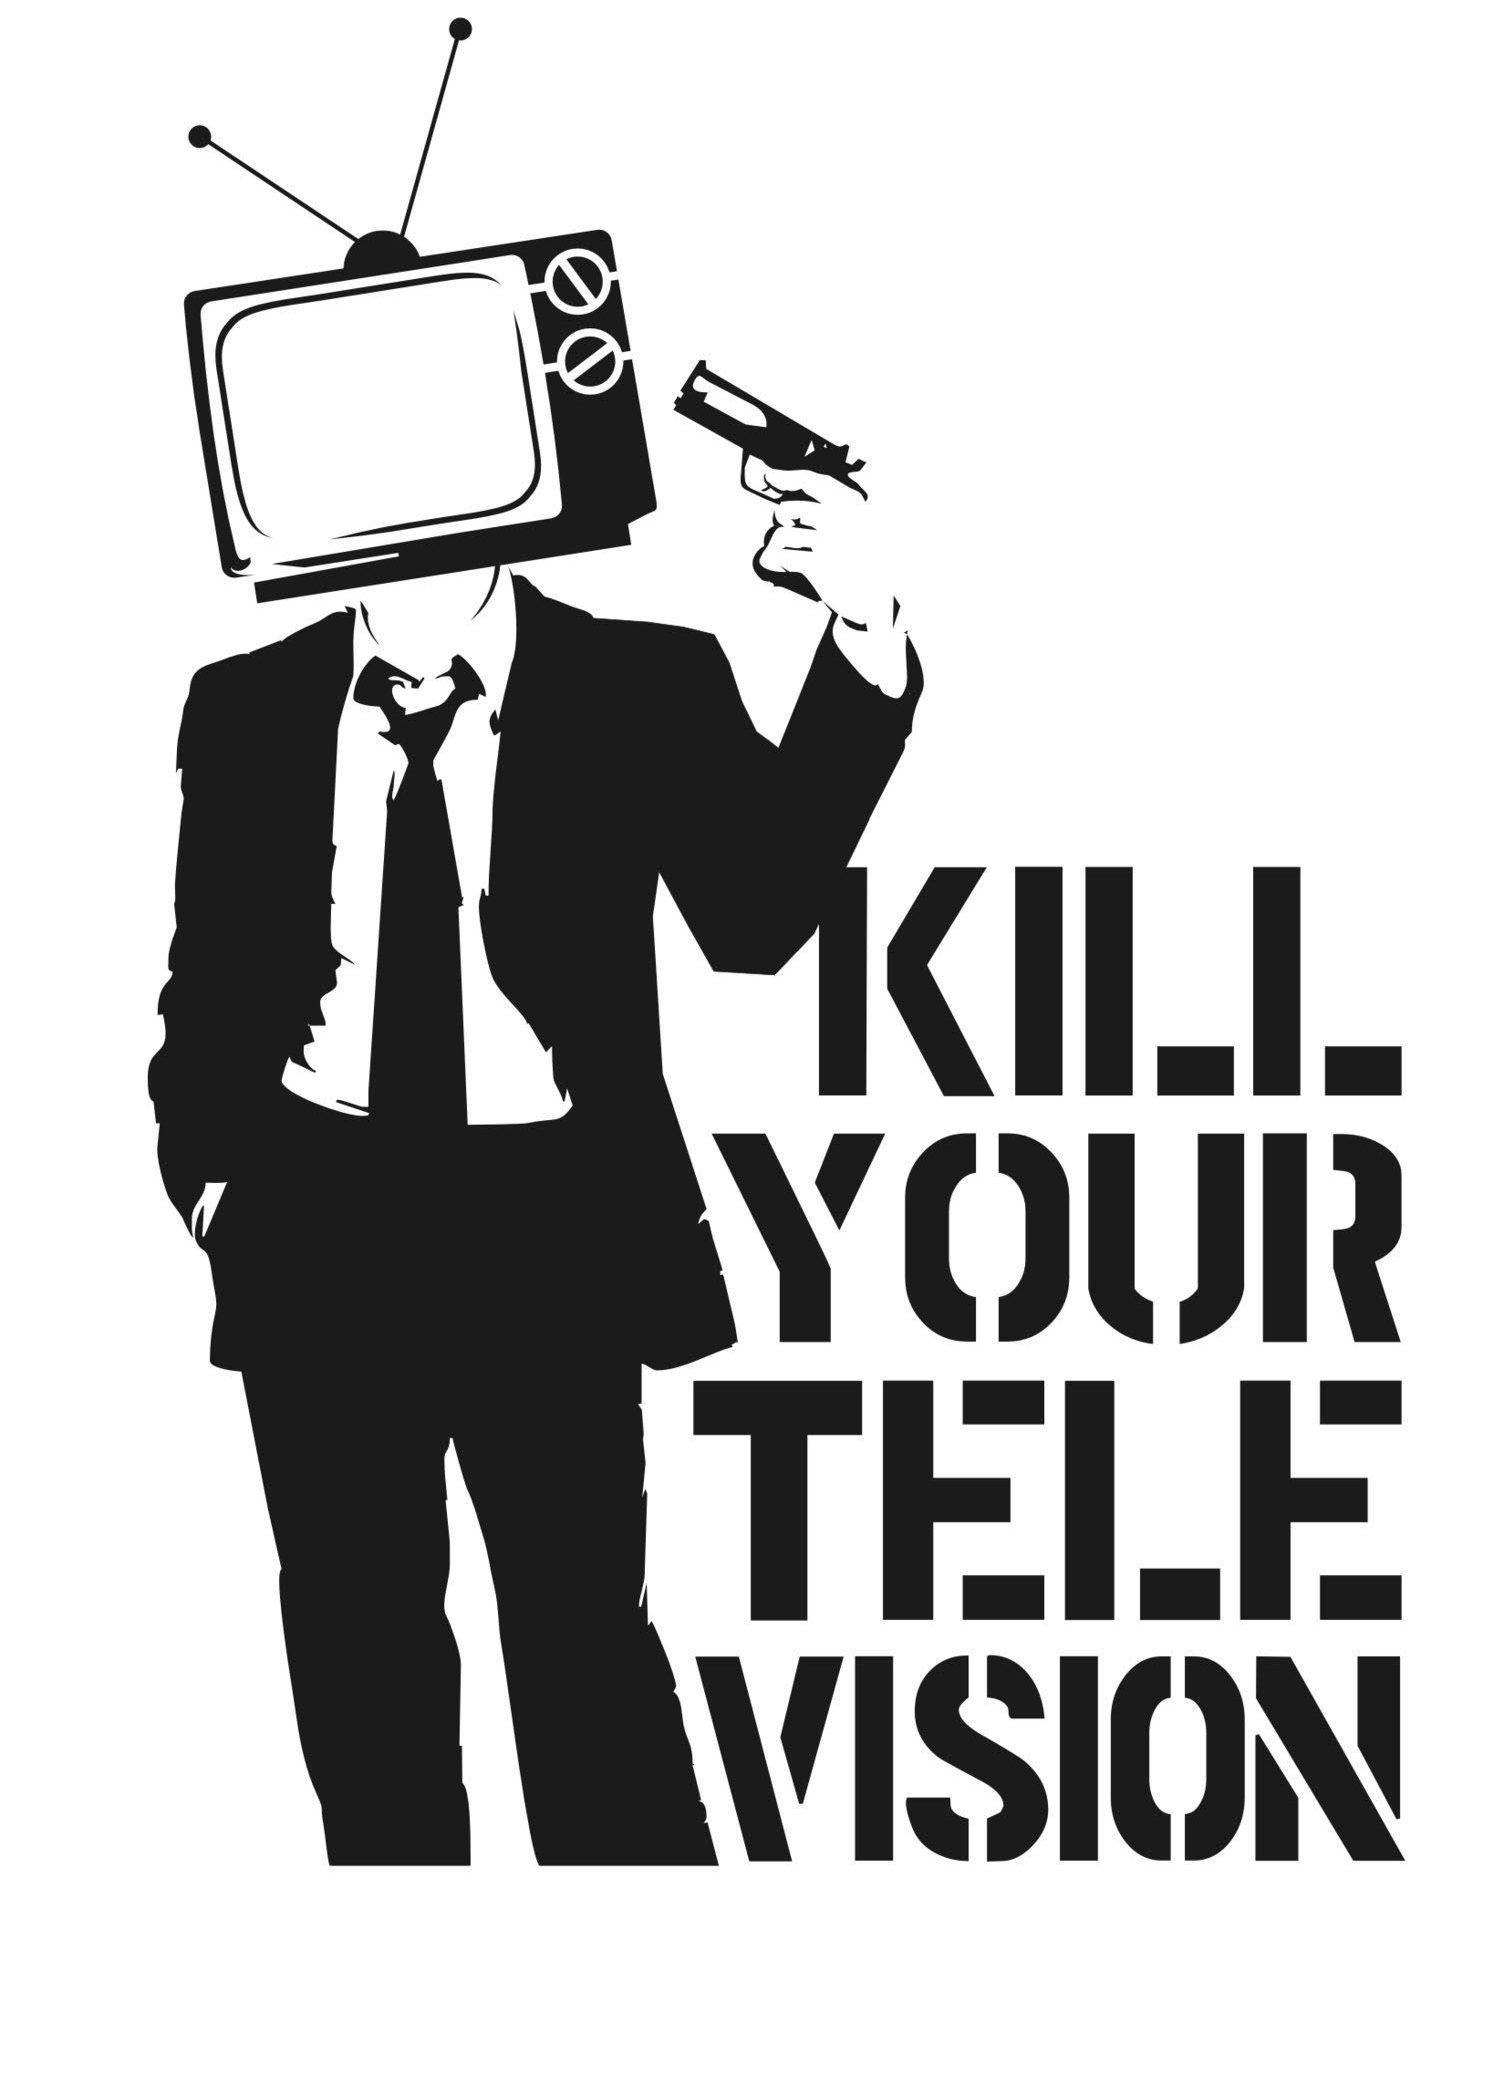 fast track πρόγραμμα εγγυημένου εισοδήματος kill your tv